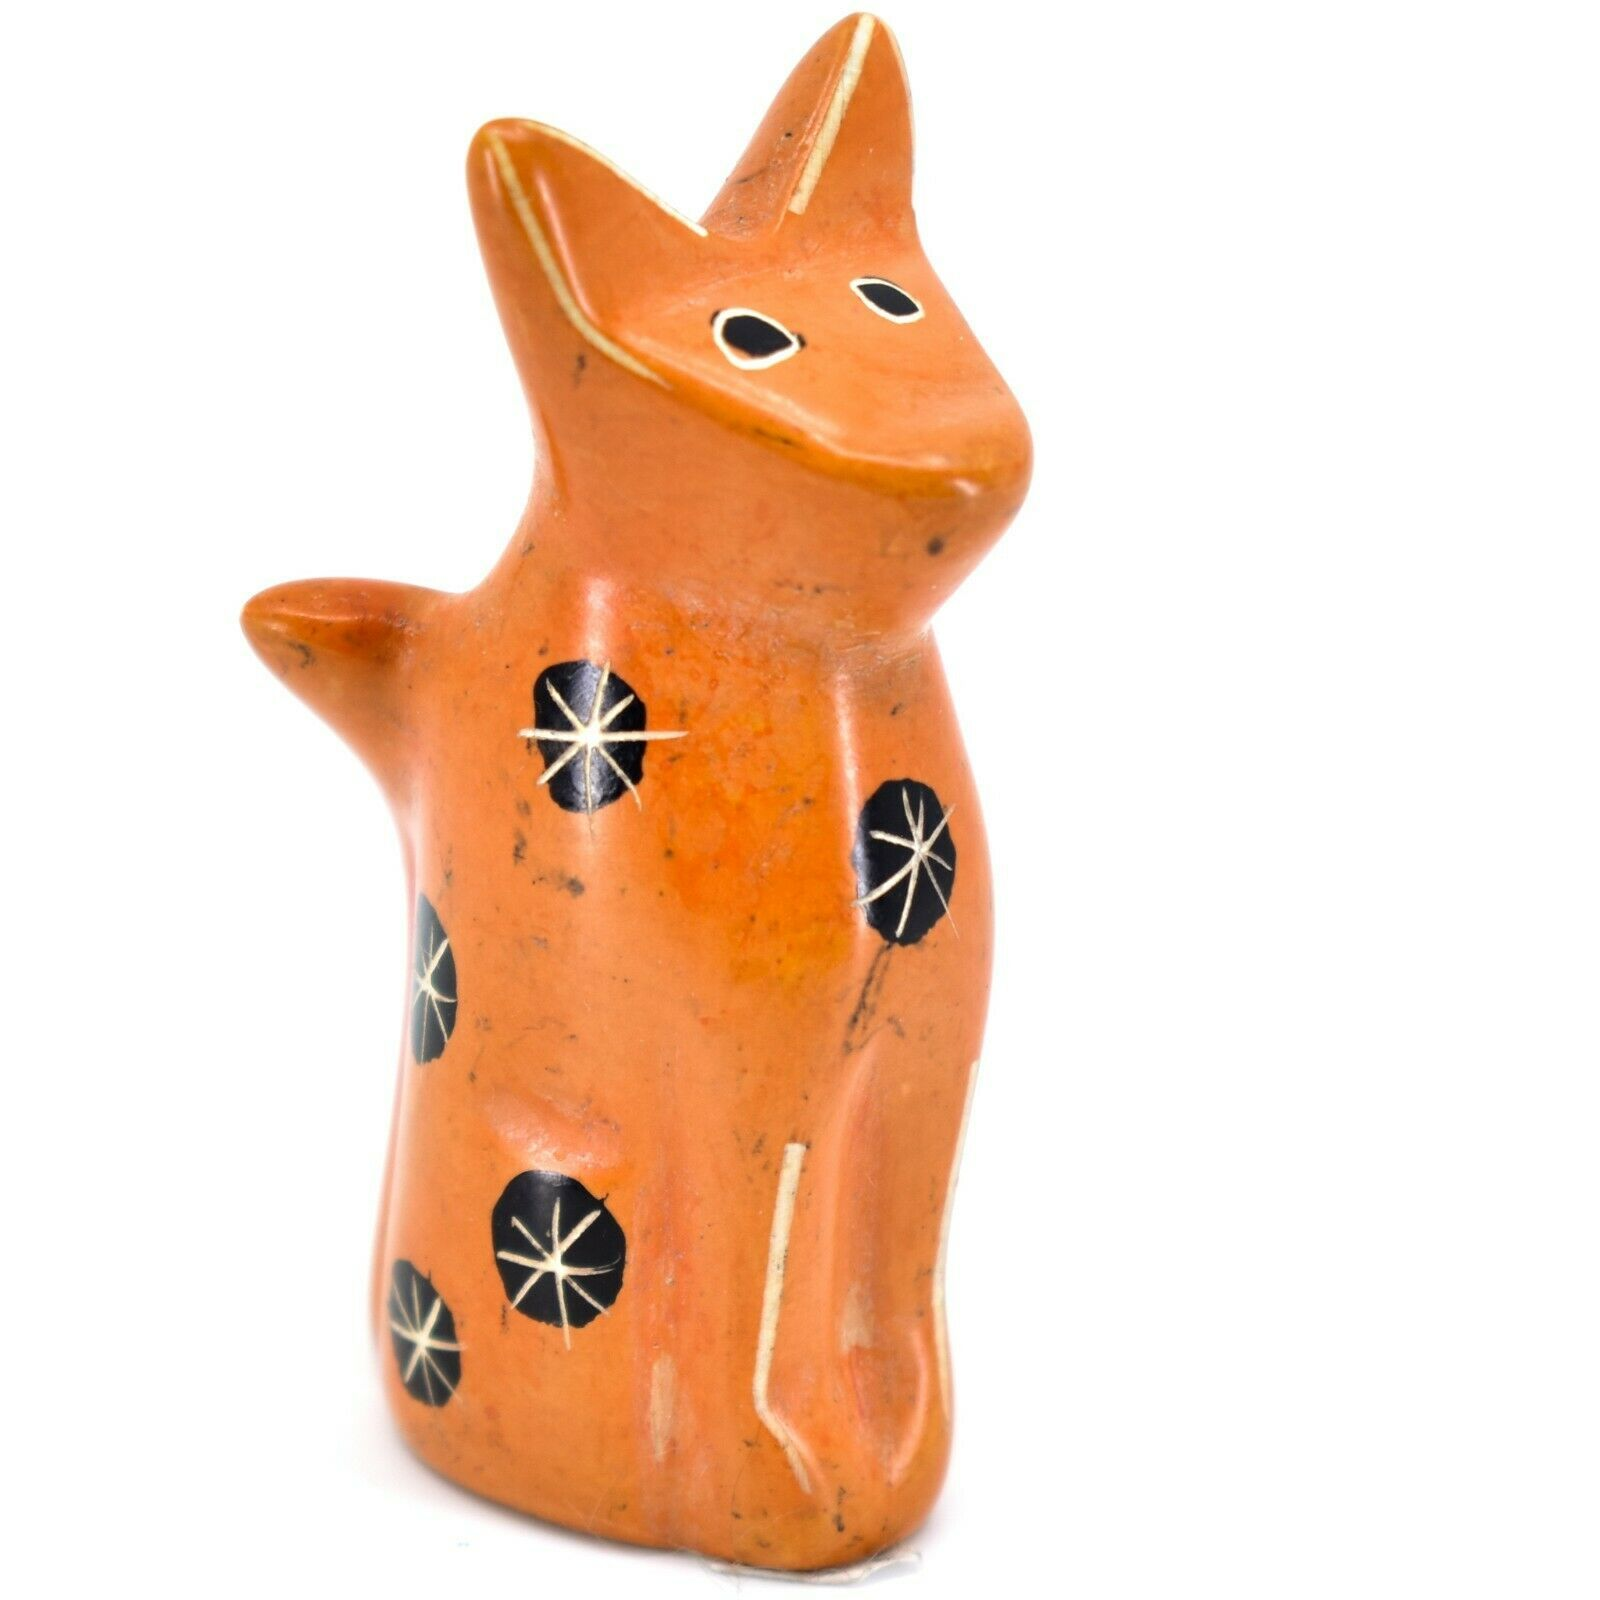 SMOLArt Hand Carved Soapstone Orange Sitting Kitten Cat Figurine Made Kenya